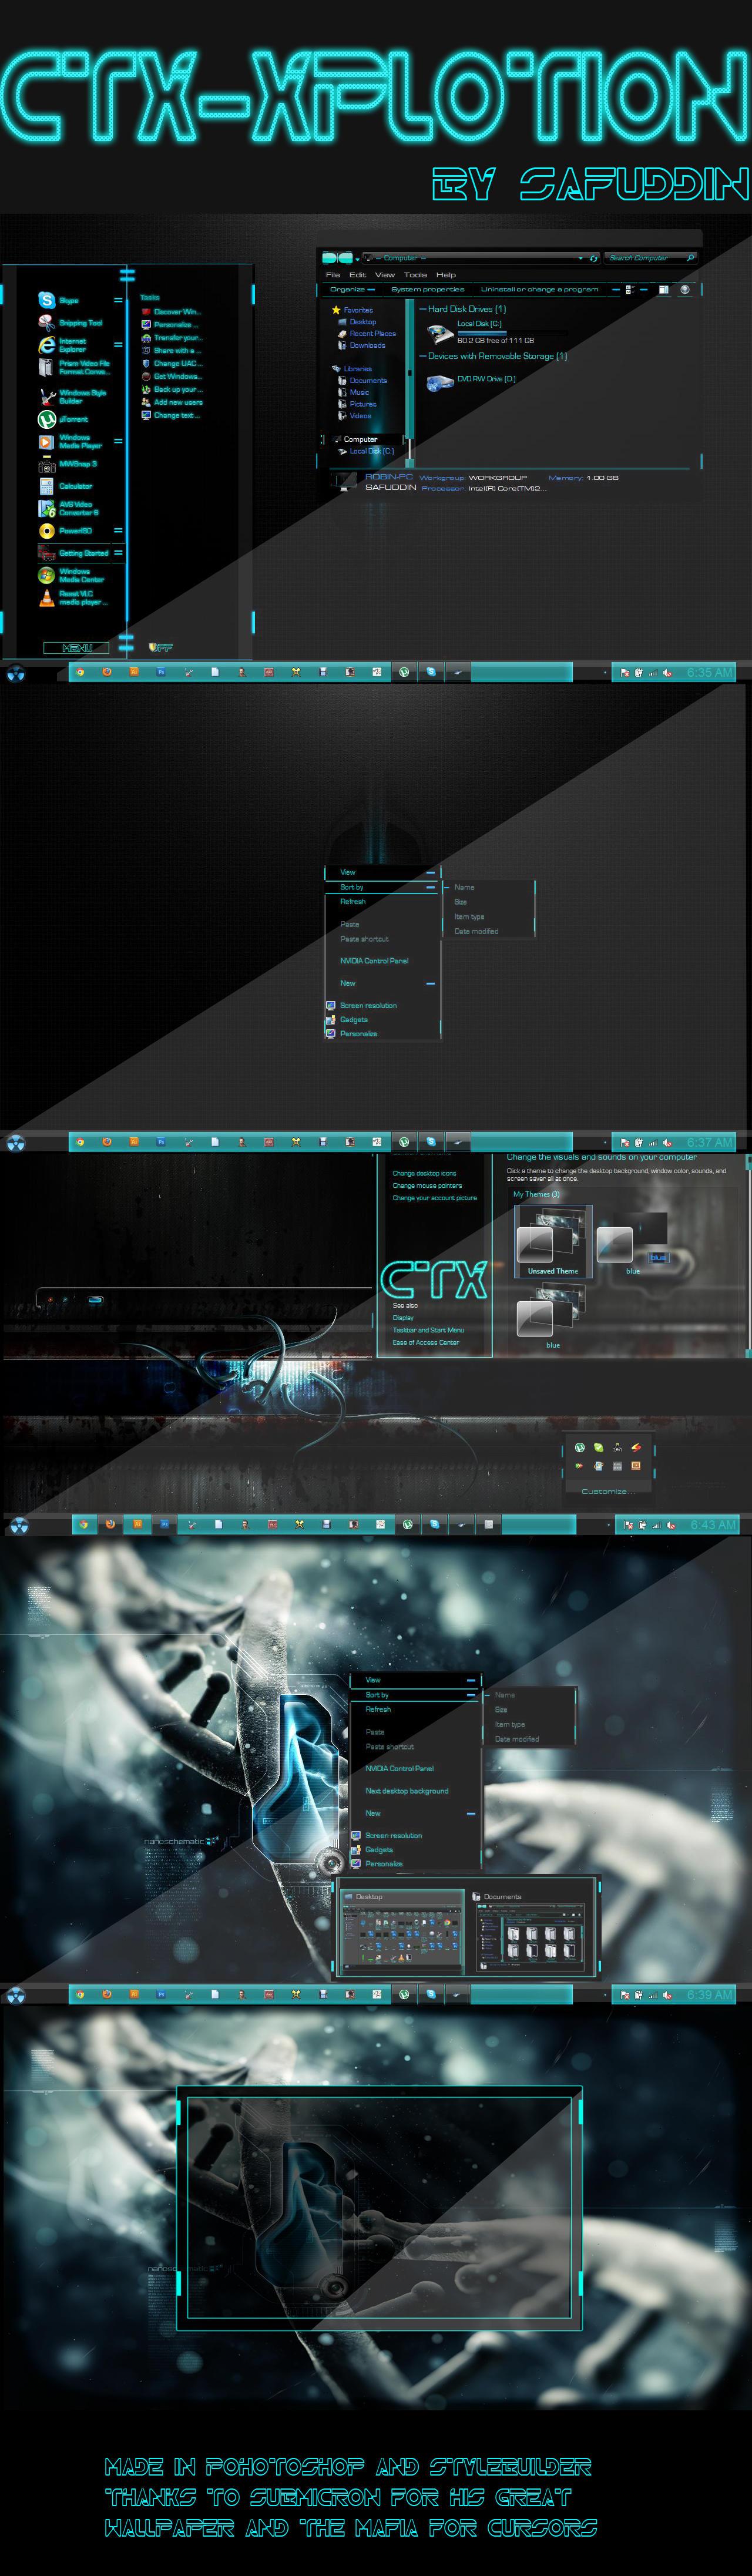 creativx-plosion by Robin-safuddin